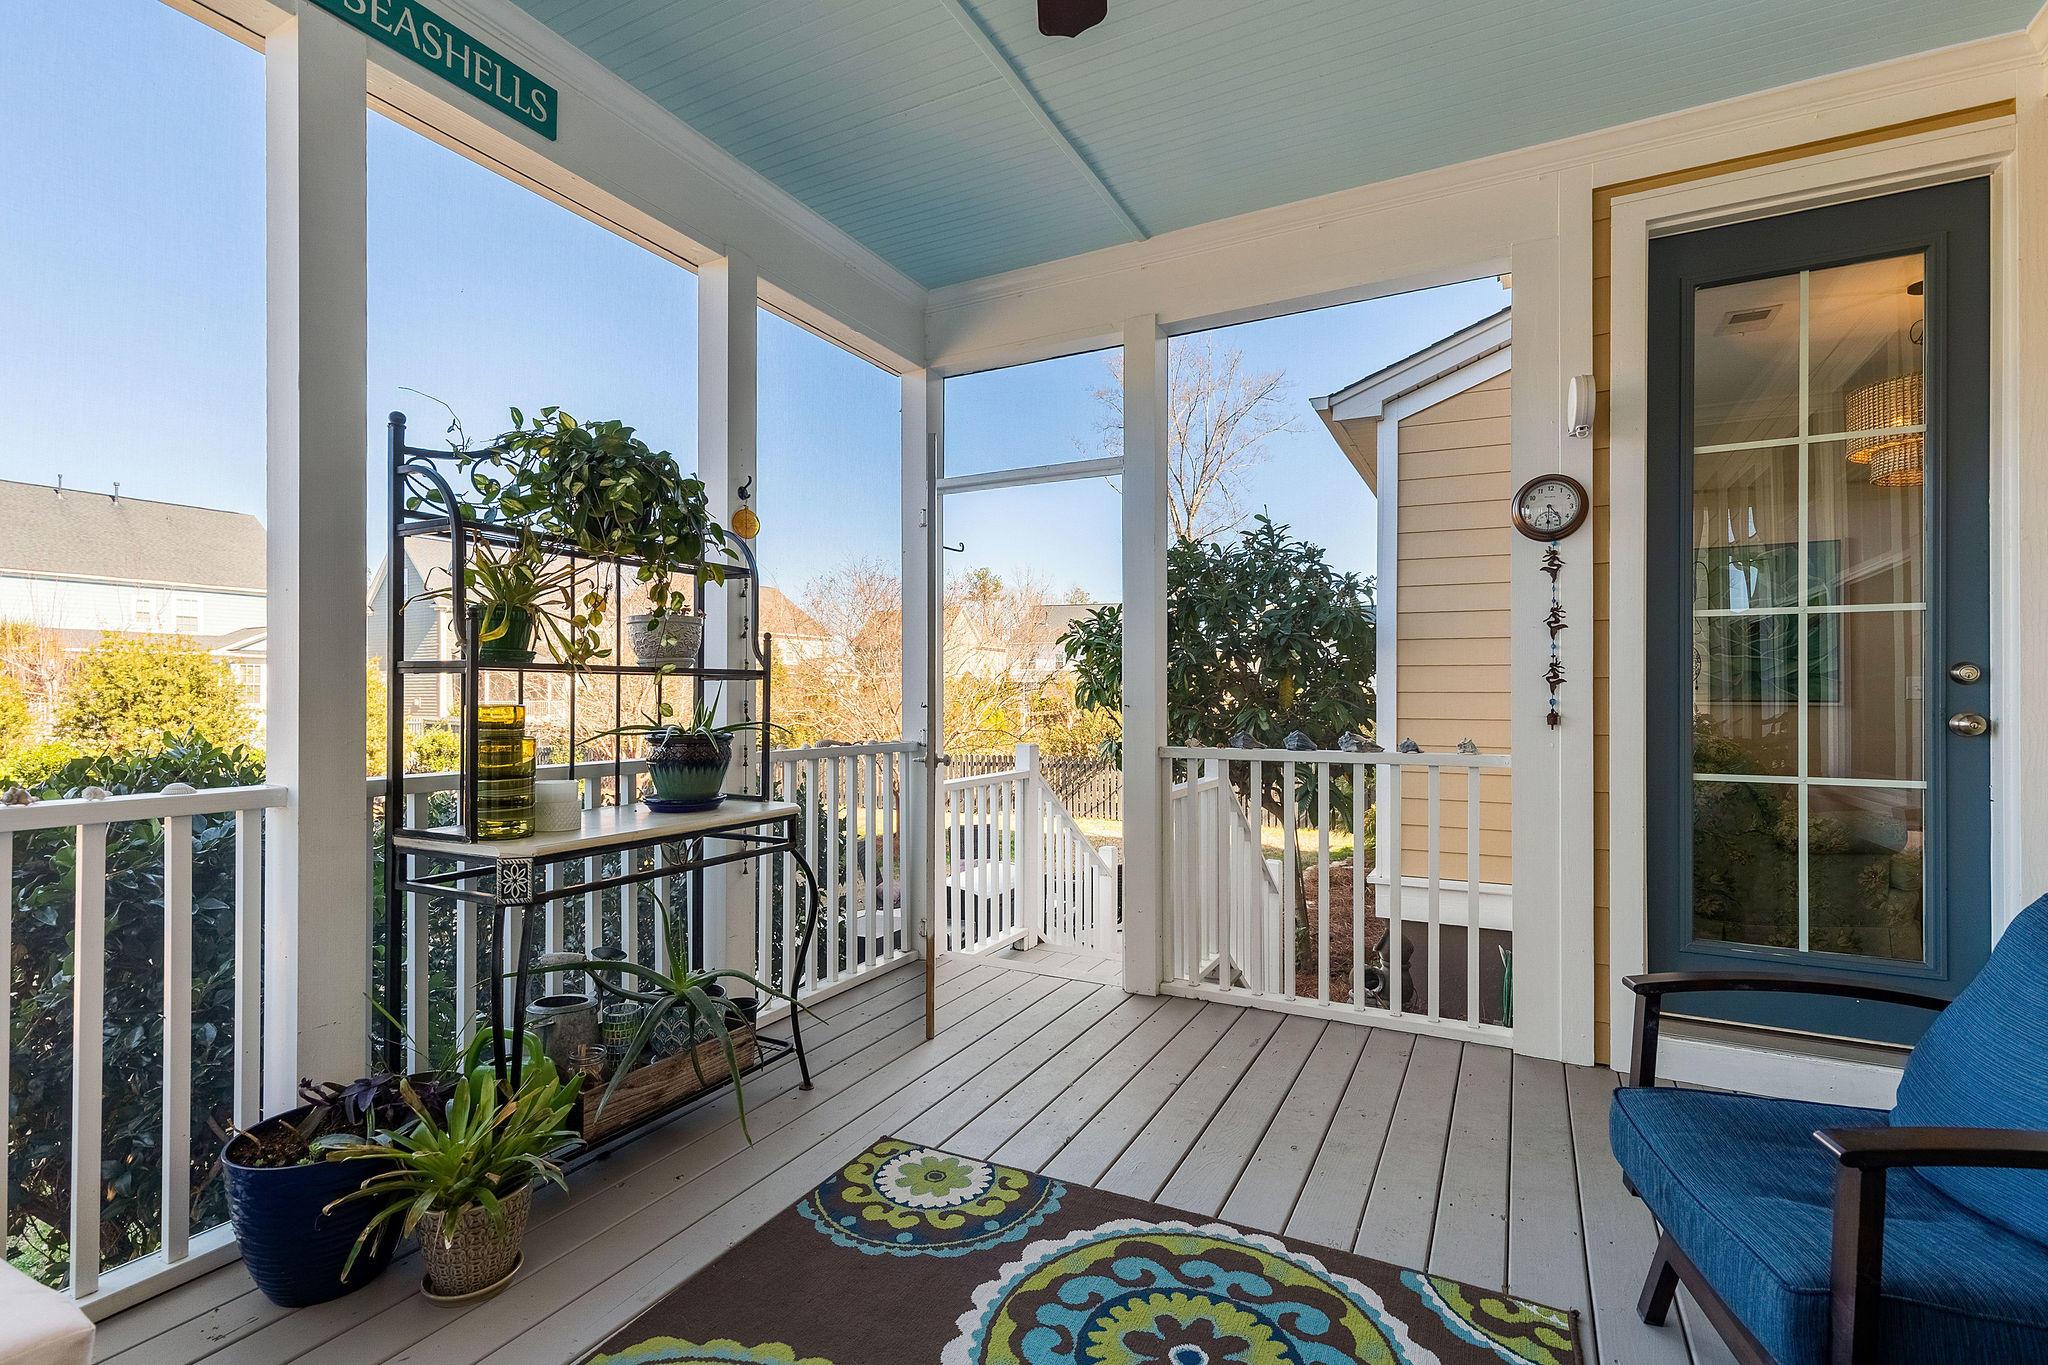 Dunes West Homes For Sale - 3212 Hatchway, Mount Pleasant, SC - 64